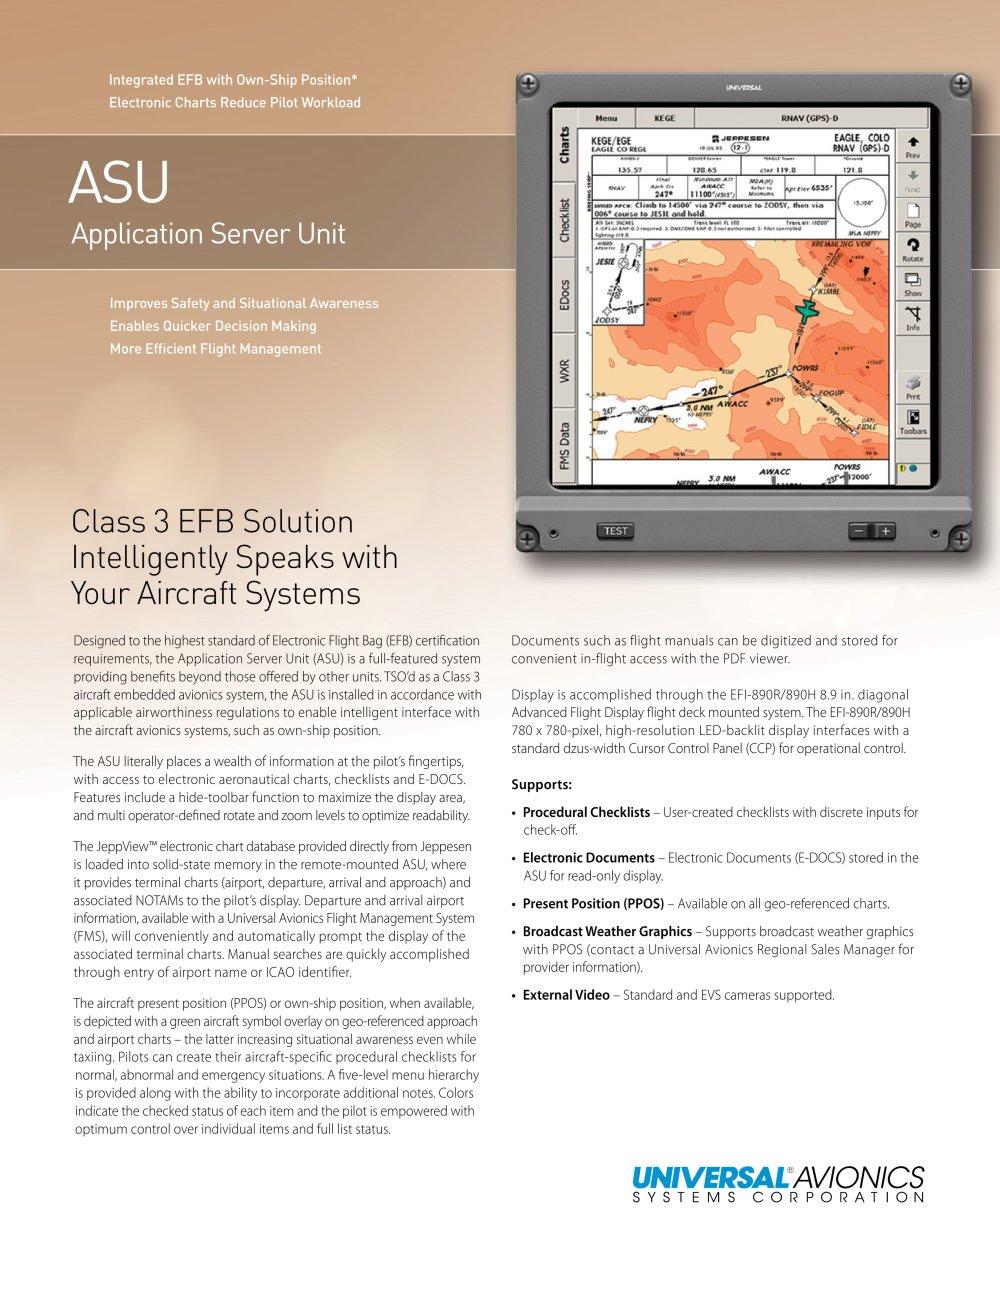 ASU - Universal Avionics Systems Corp. - PDF Catalogue | Technical ...